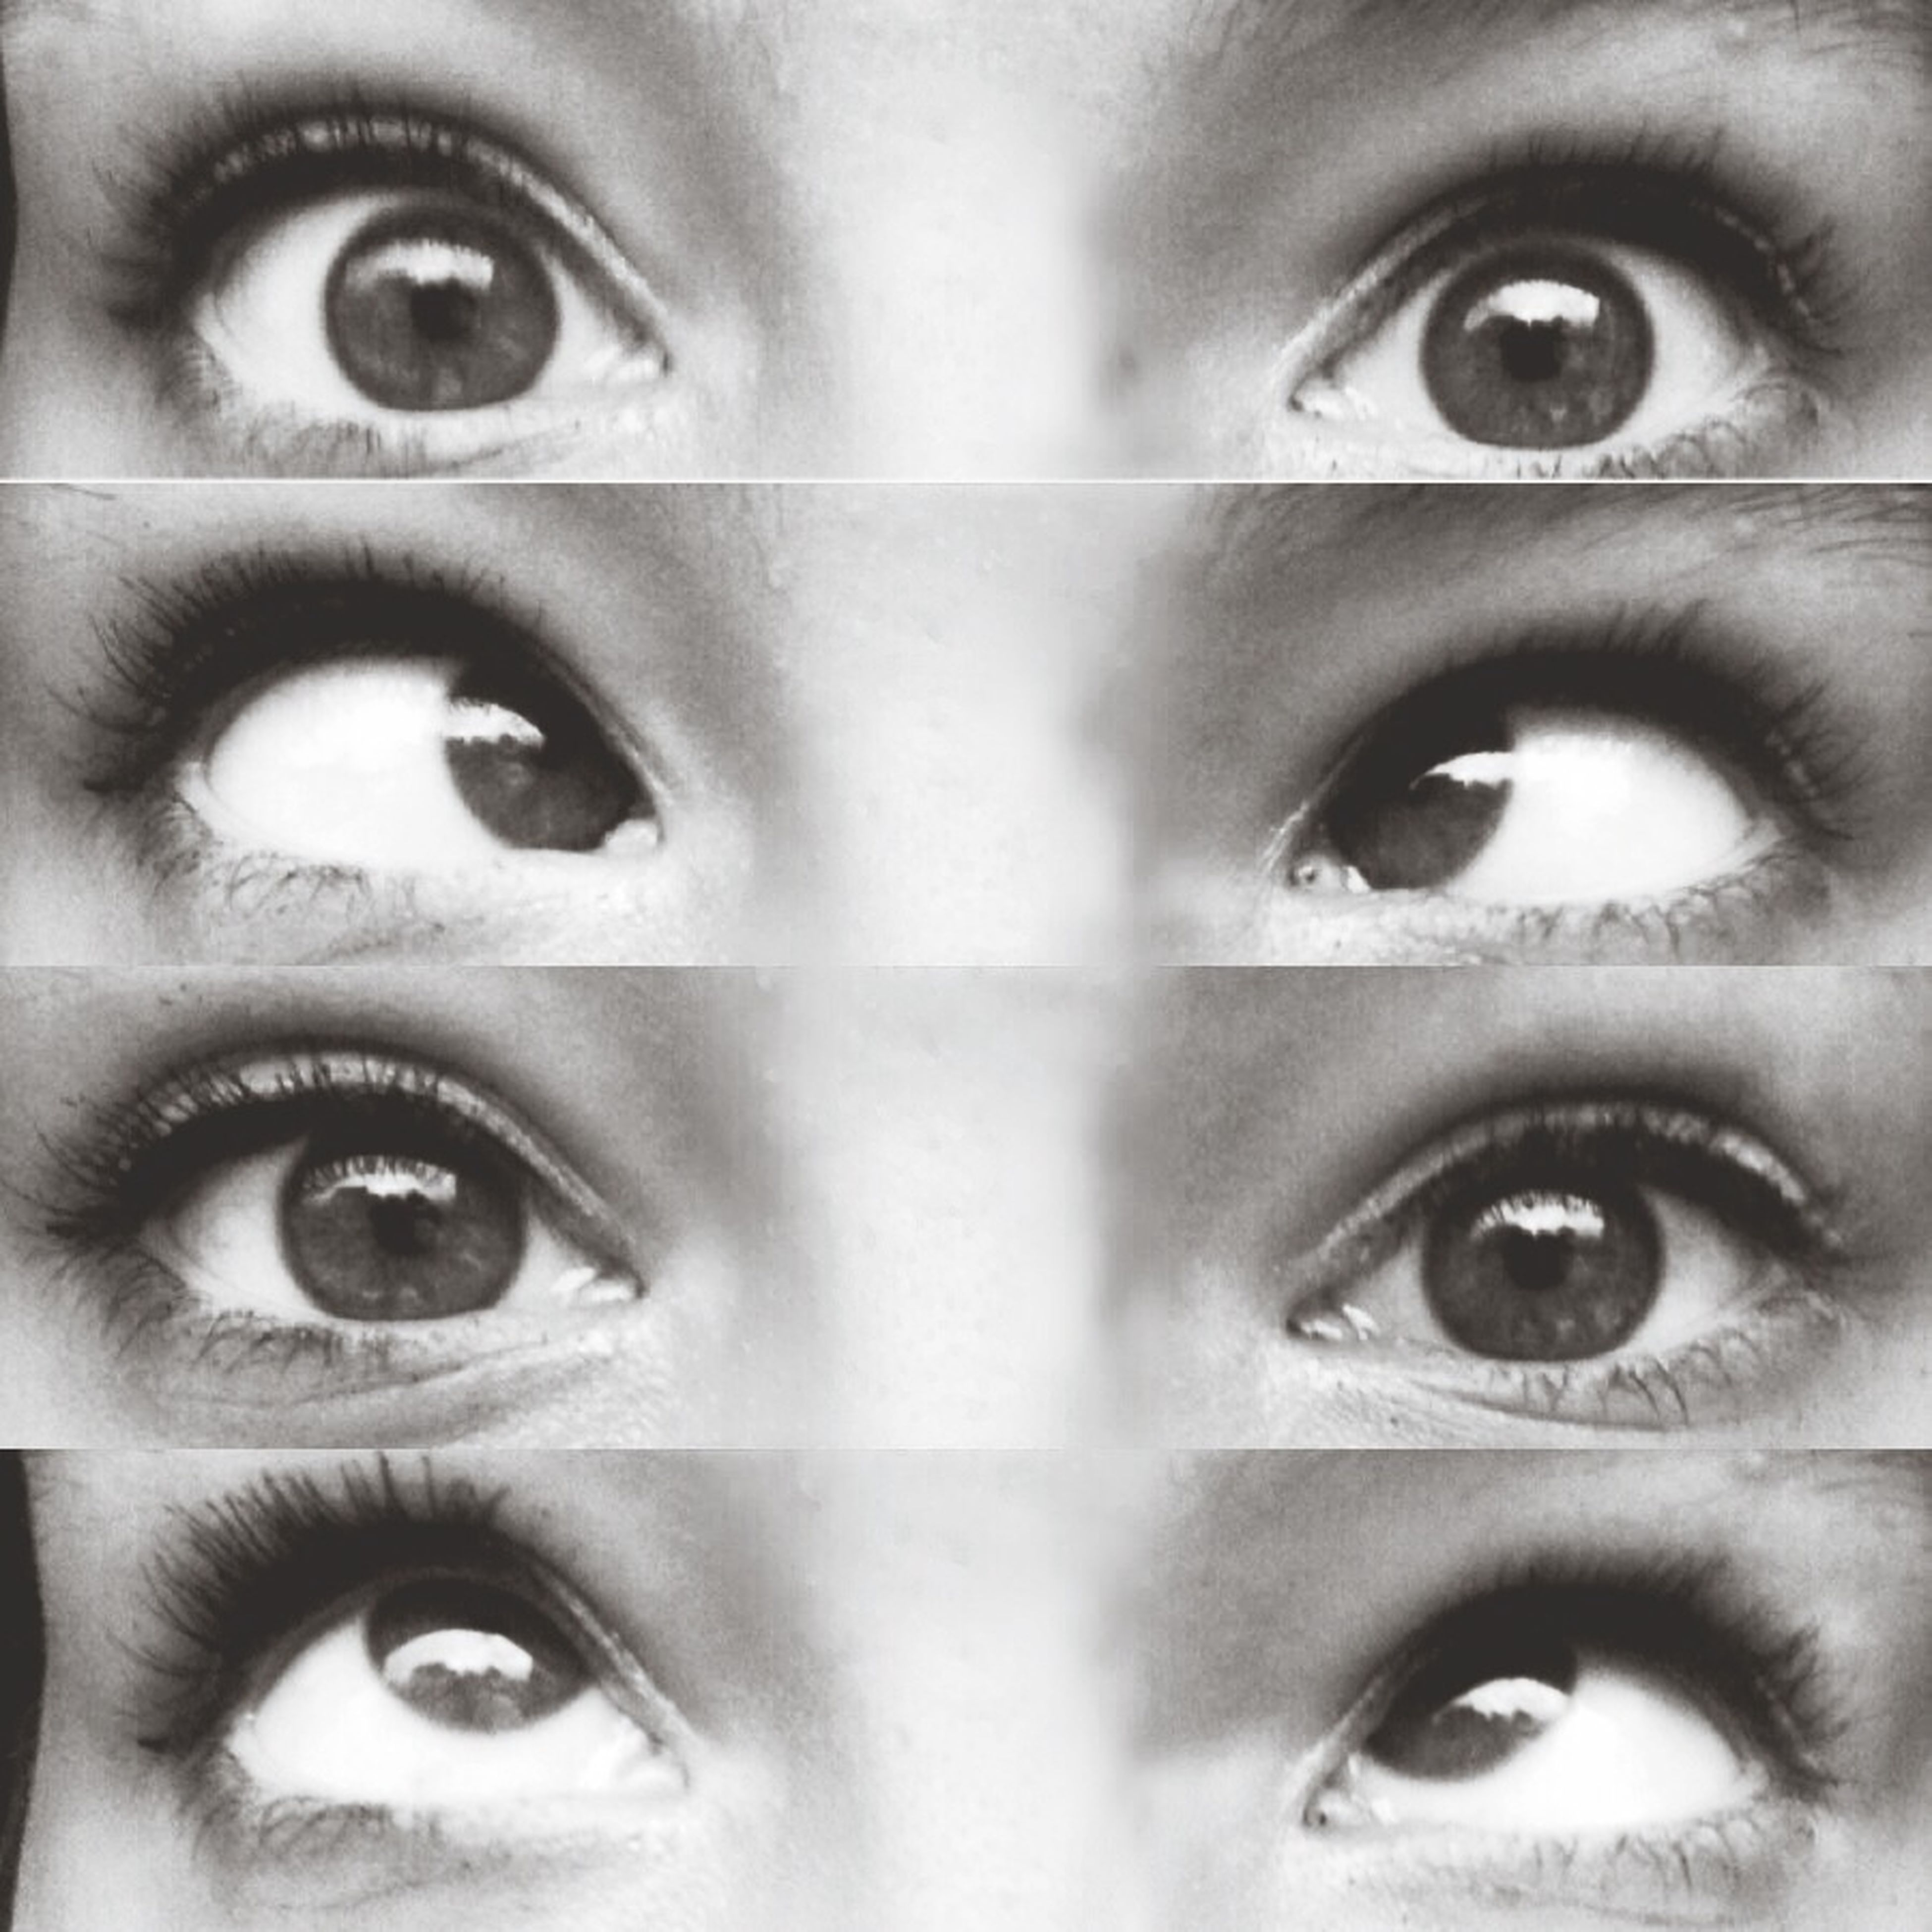 human eye, close-up, indoors, full frame, backgrounds, looking at camera, part of, portrait, human face, eyelash, eyesight, extreme close-up, lifestyles, detail, sensory perception, circle, cropped